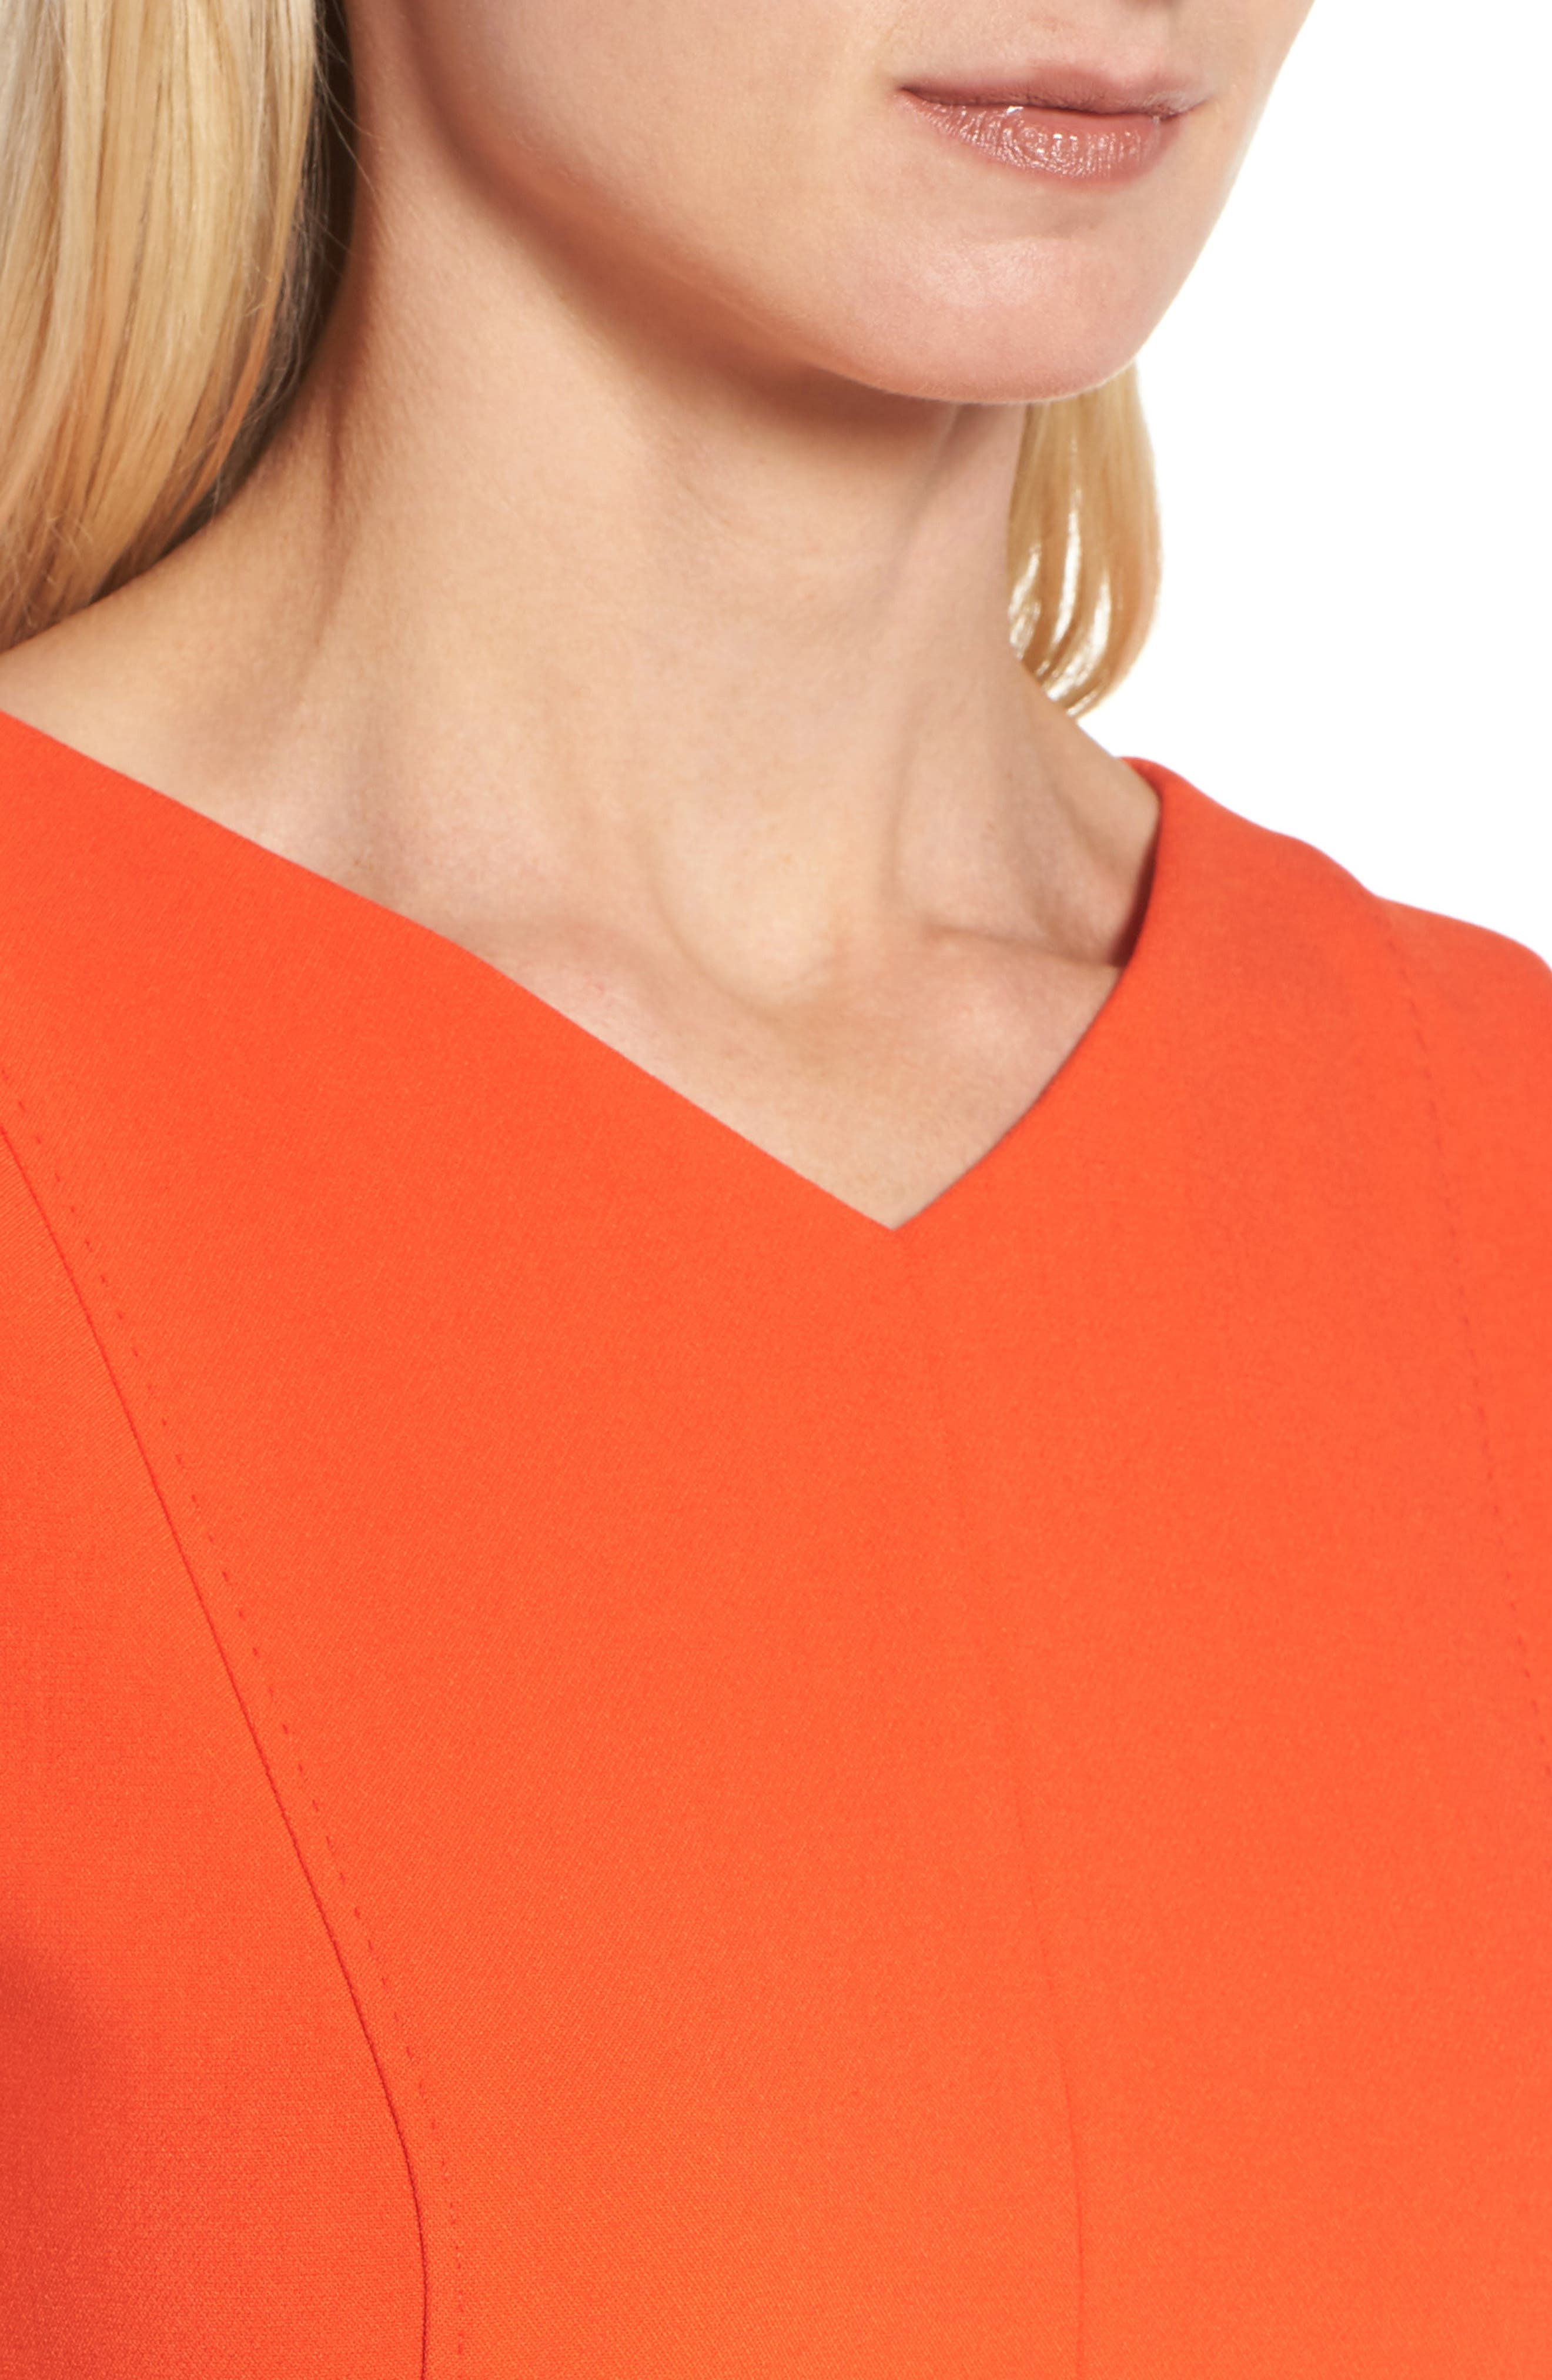 Delafea Sheath Dress,                             Alternate thumbnail 4, color,                             625